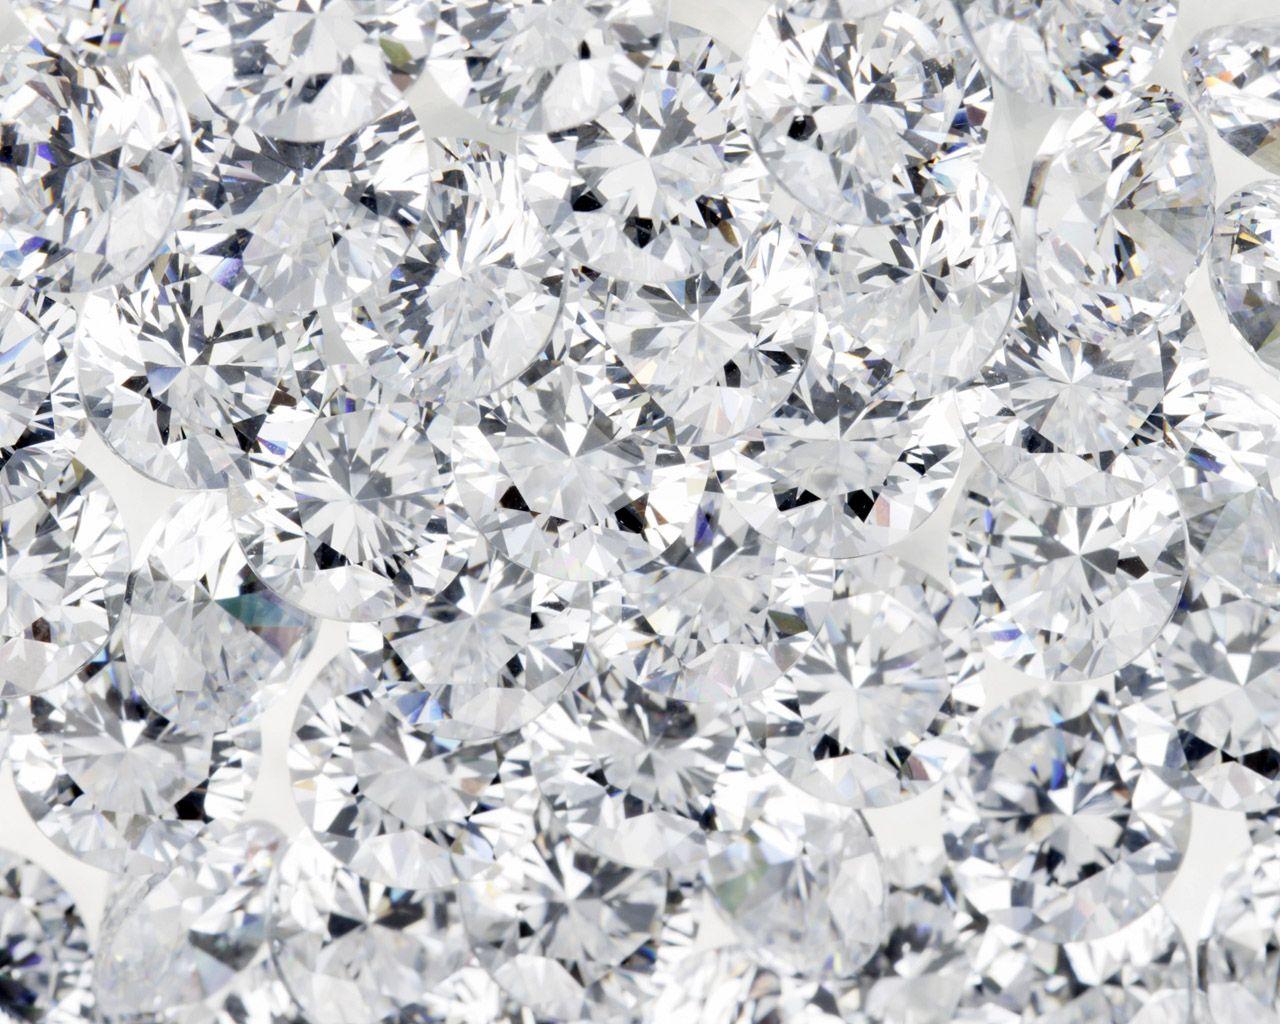 Spread Them Out Diamond Jewels Diamond Wallpaper Diamond